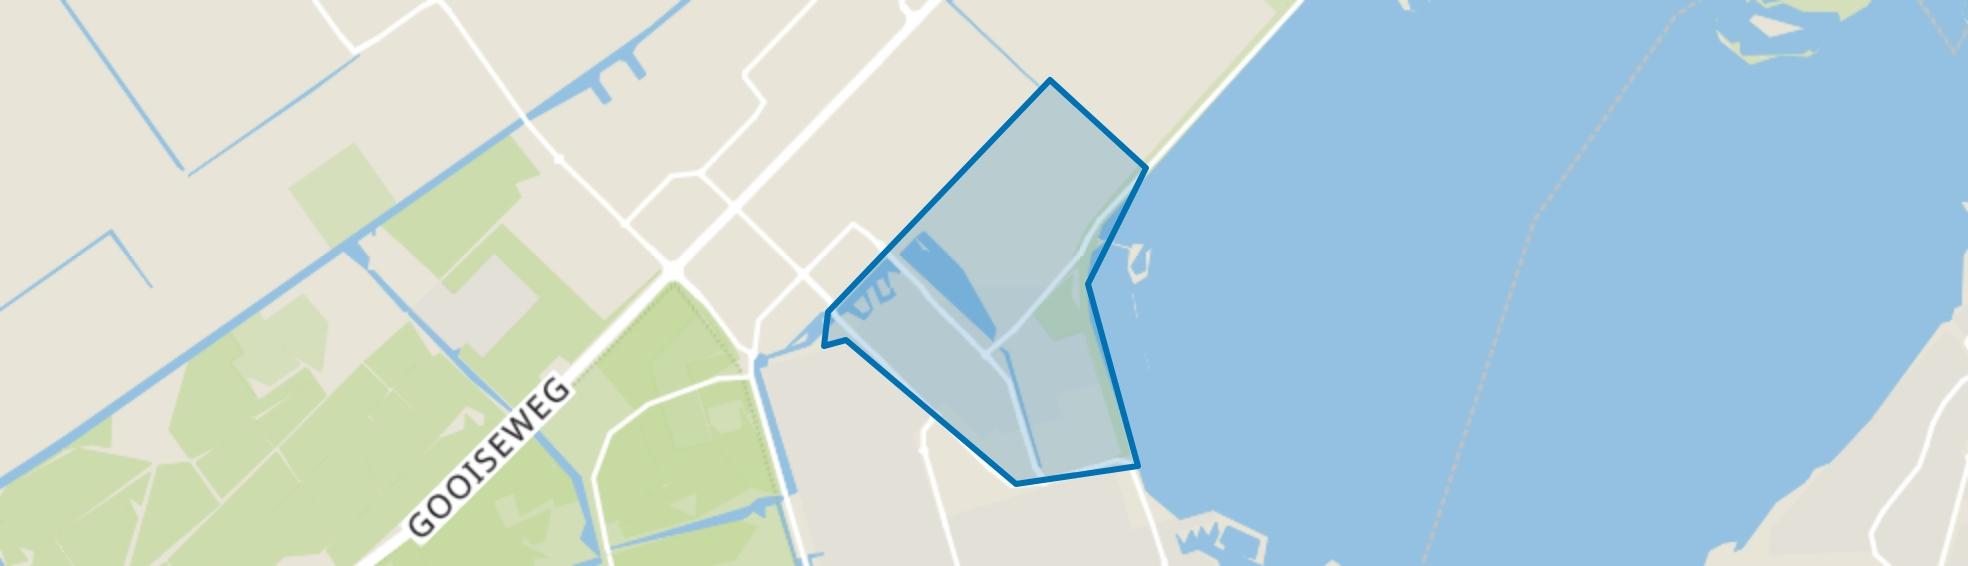 Buurt 4, Zeewolde map